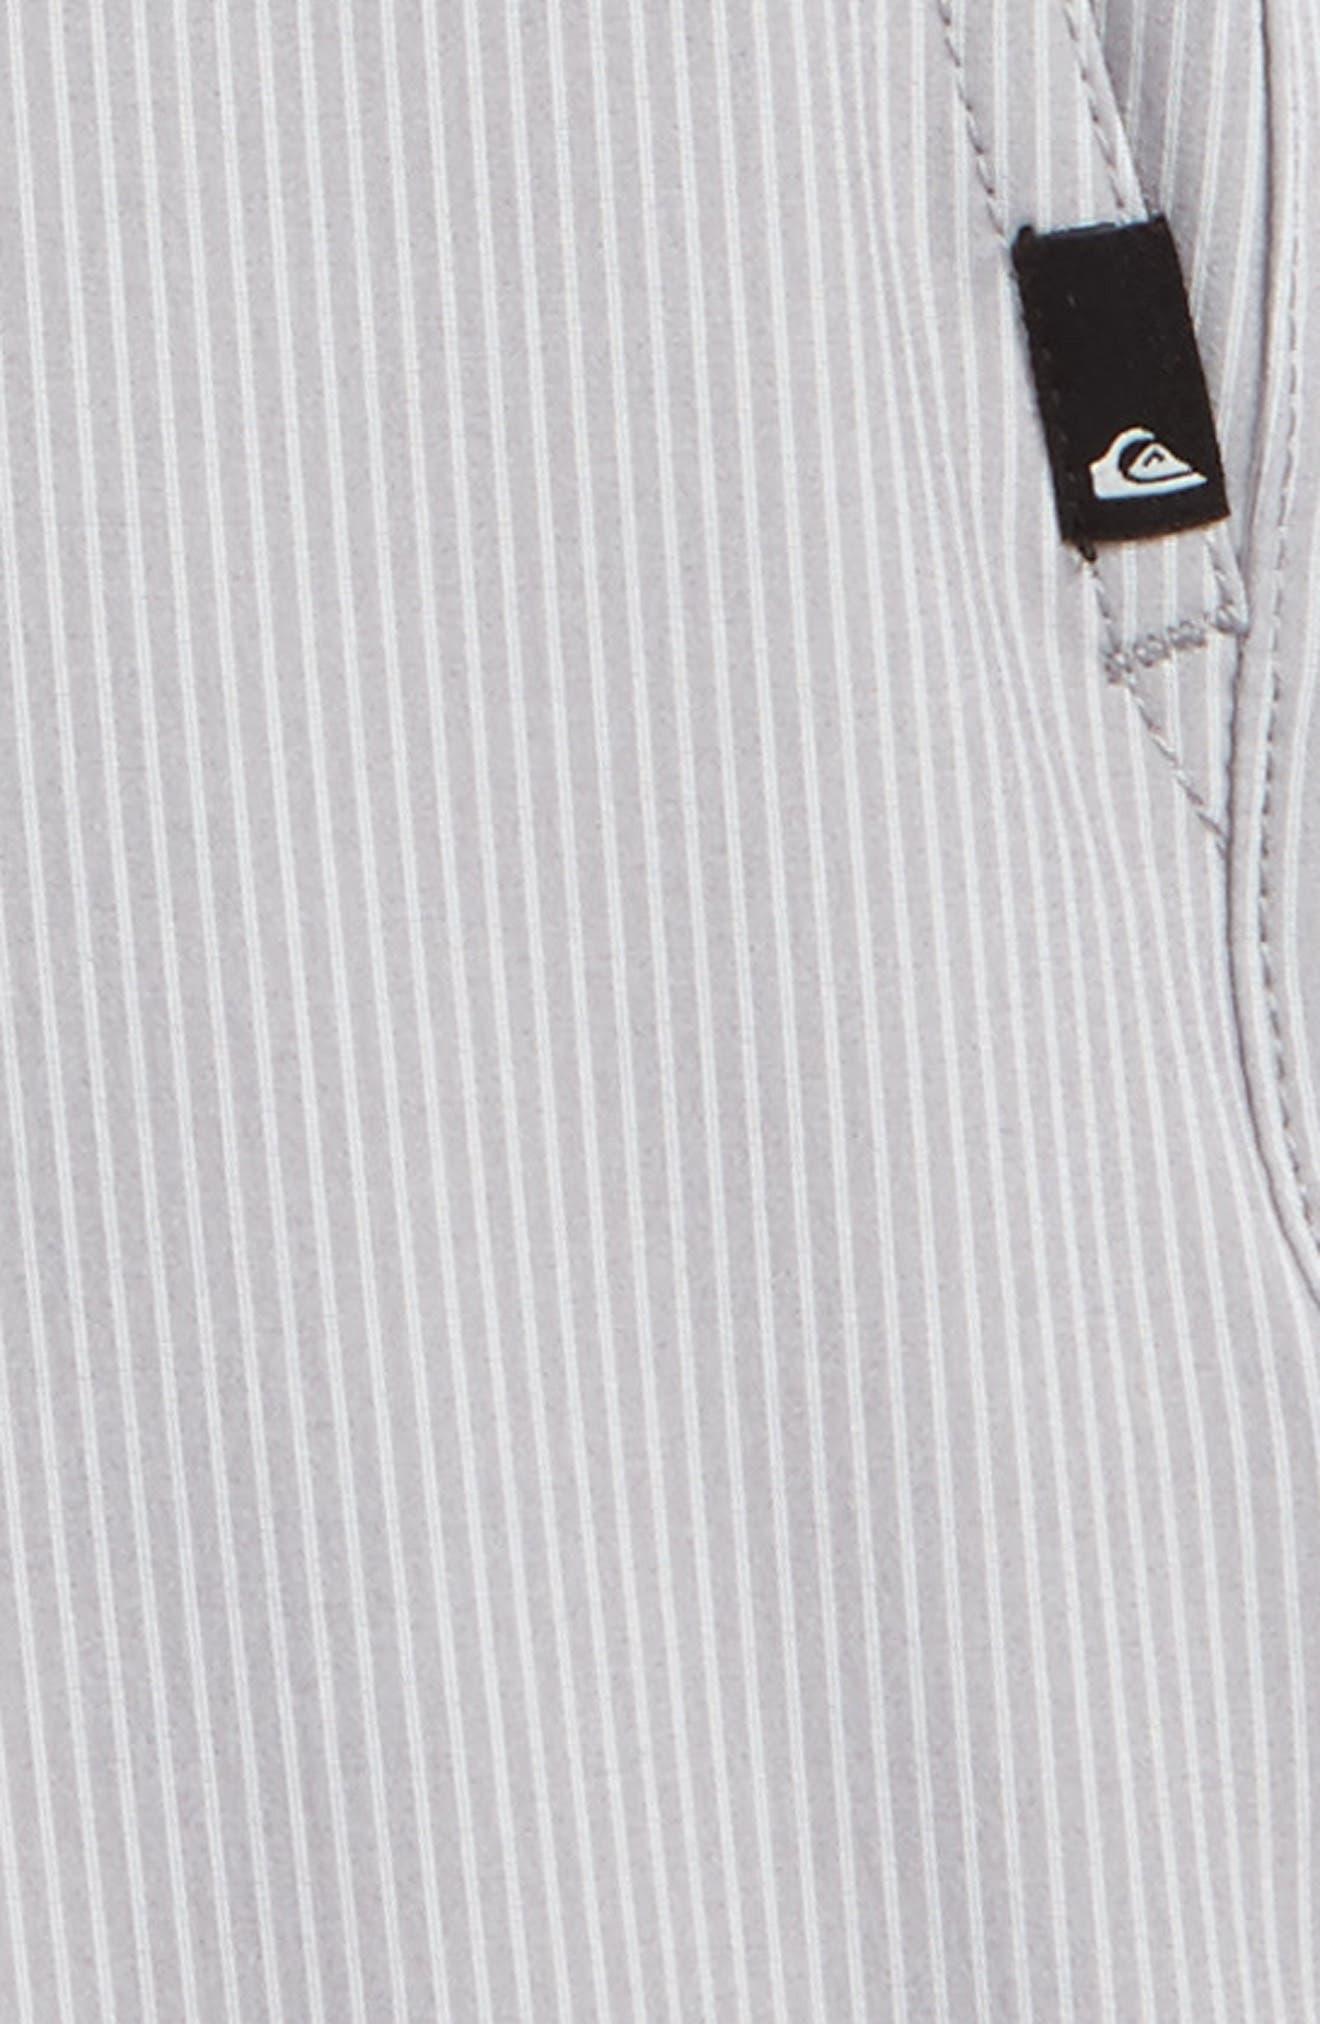 Union Pinstripe Amphibian Board Shorts,                             Alternate thumbnail 3, color,                             031